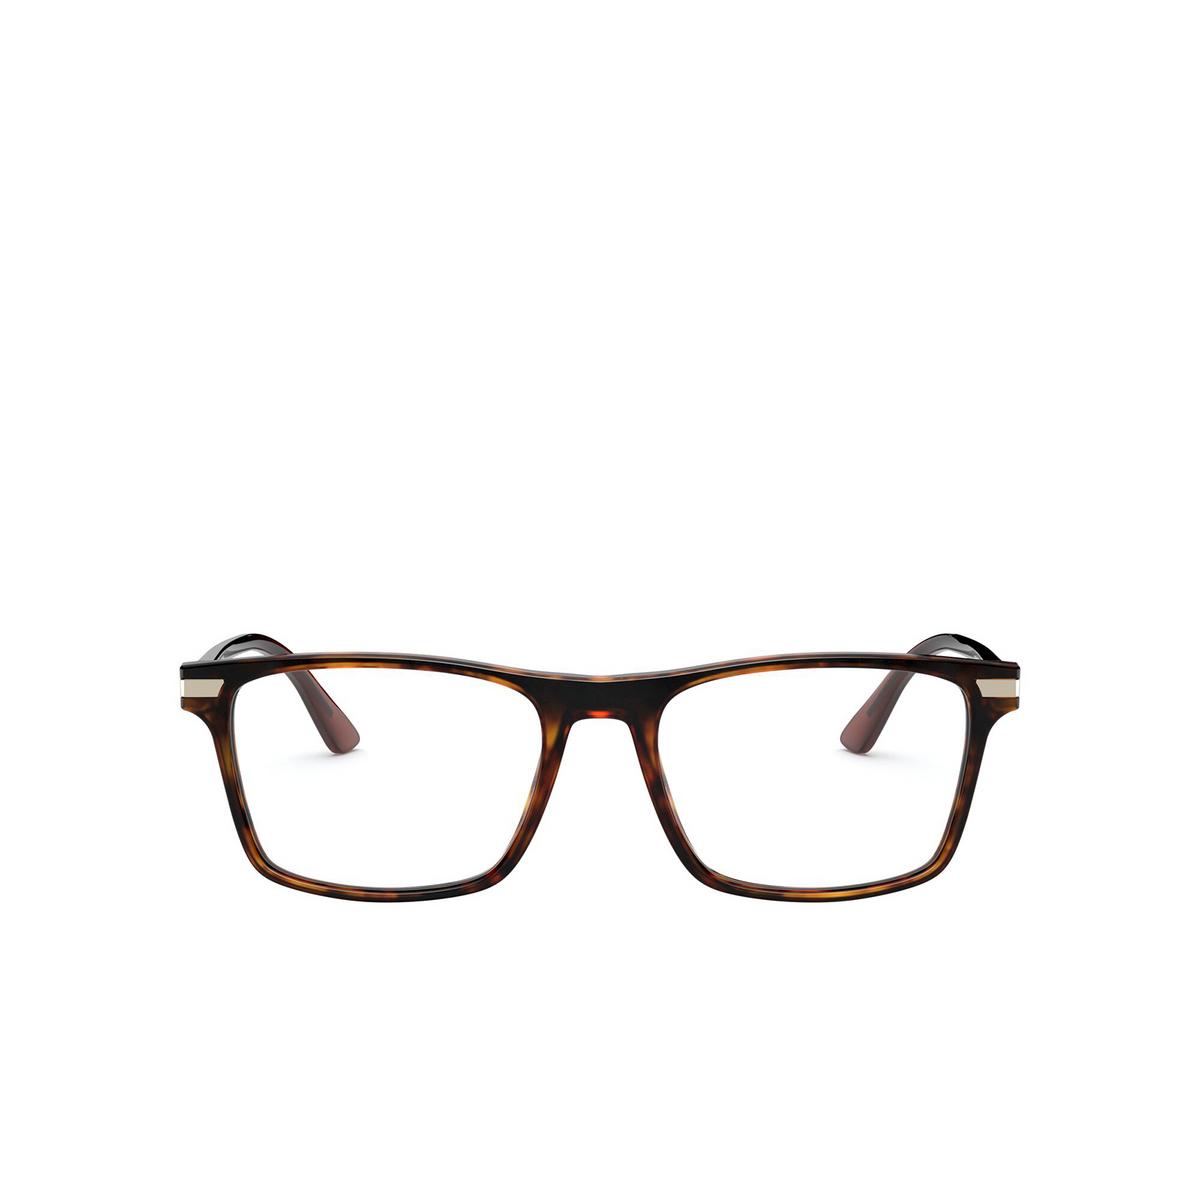 Prada® Rectangle Eyeglasses: PR 01WV color Havana 08F1O1 - front view.